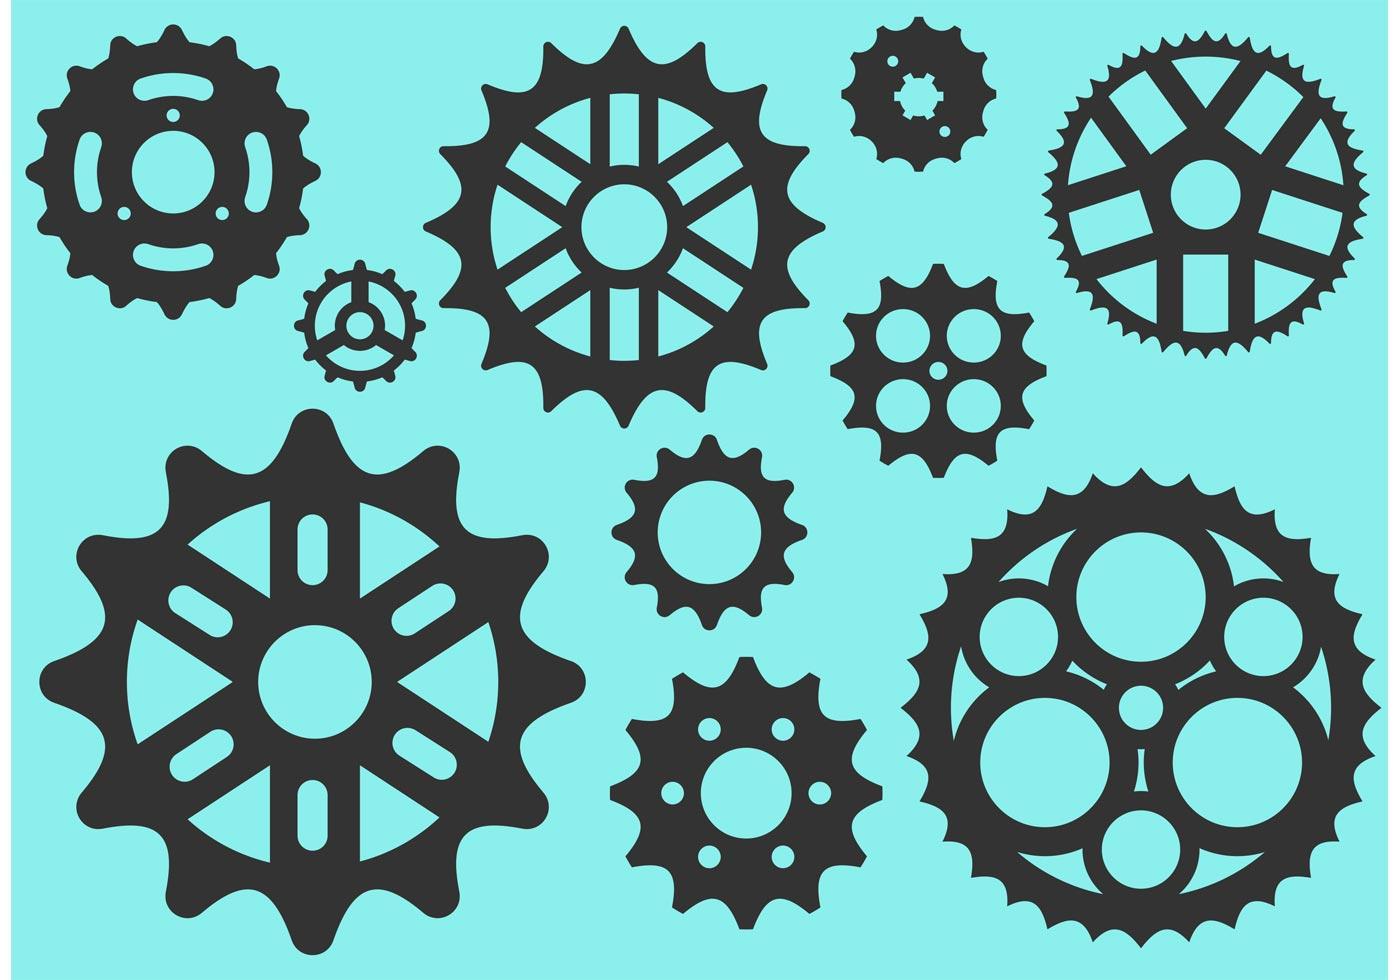 Bike gears clipart vector vector bicycle gear pictures to pin on - Bike Gears Clipart Vector Vector Bicycle Gear Pictures To